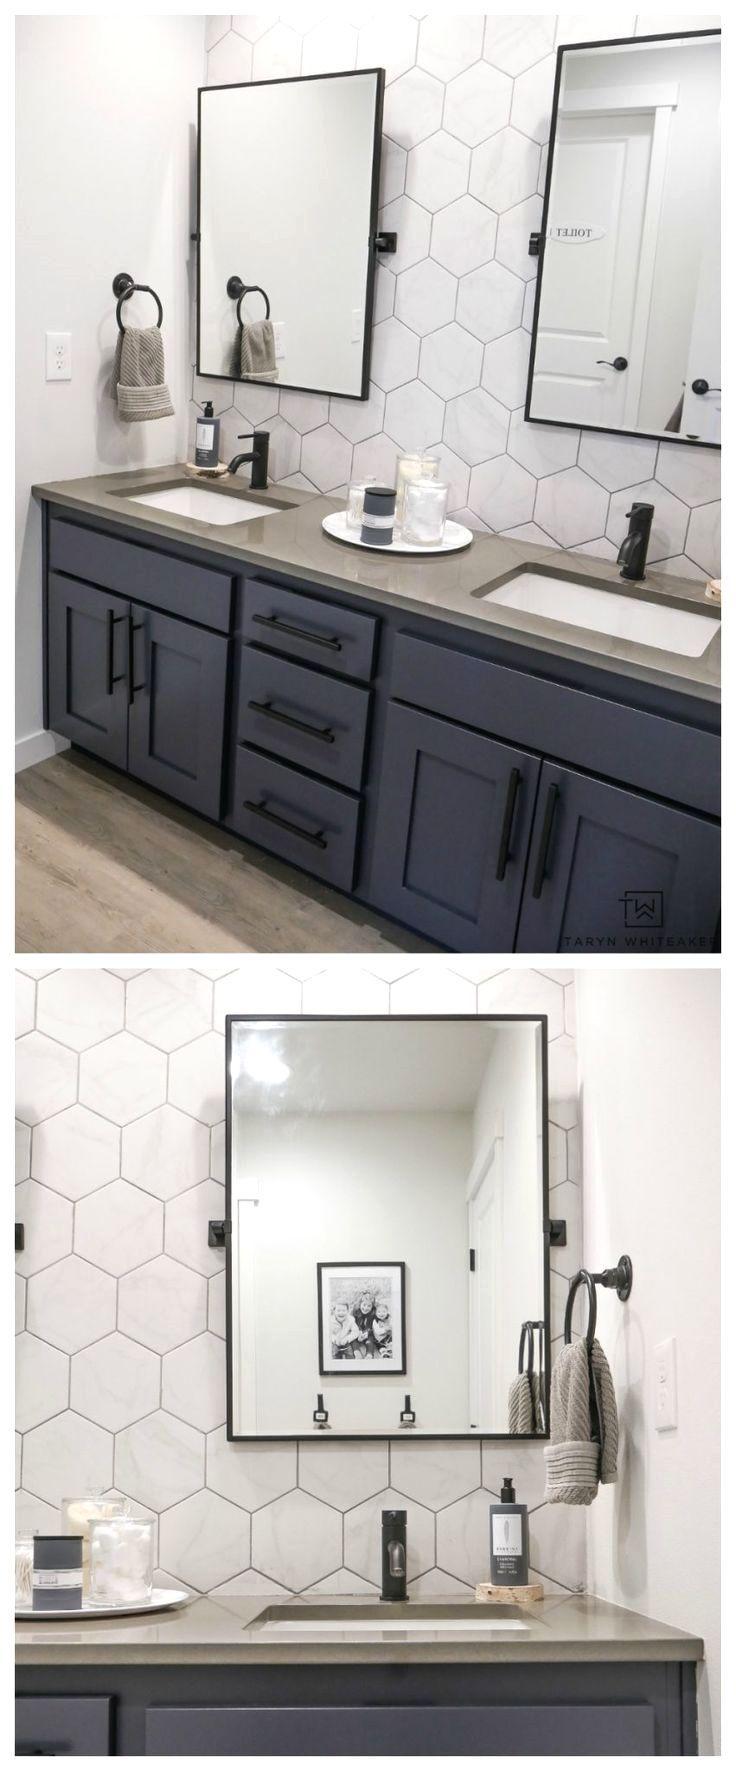 Cabinets Diy Makeover Diy Bathroom Cabinet Makeover In 2020